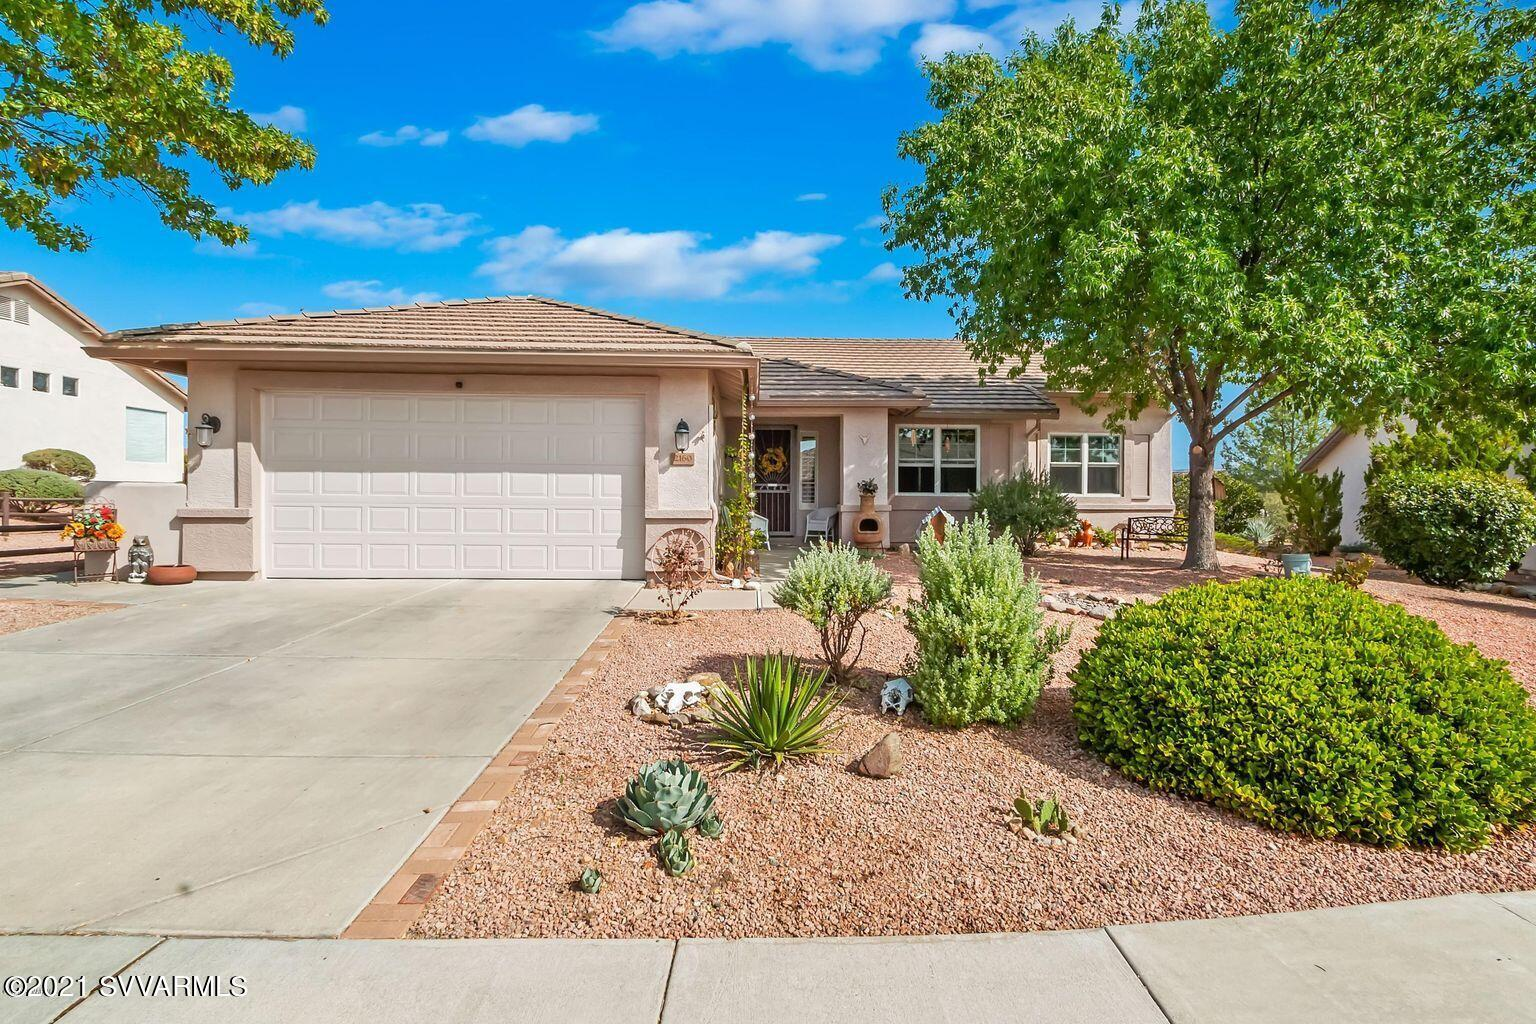 2160 W Desert Willow Drive Cottonwood, AZ 86326